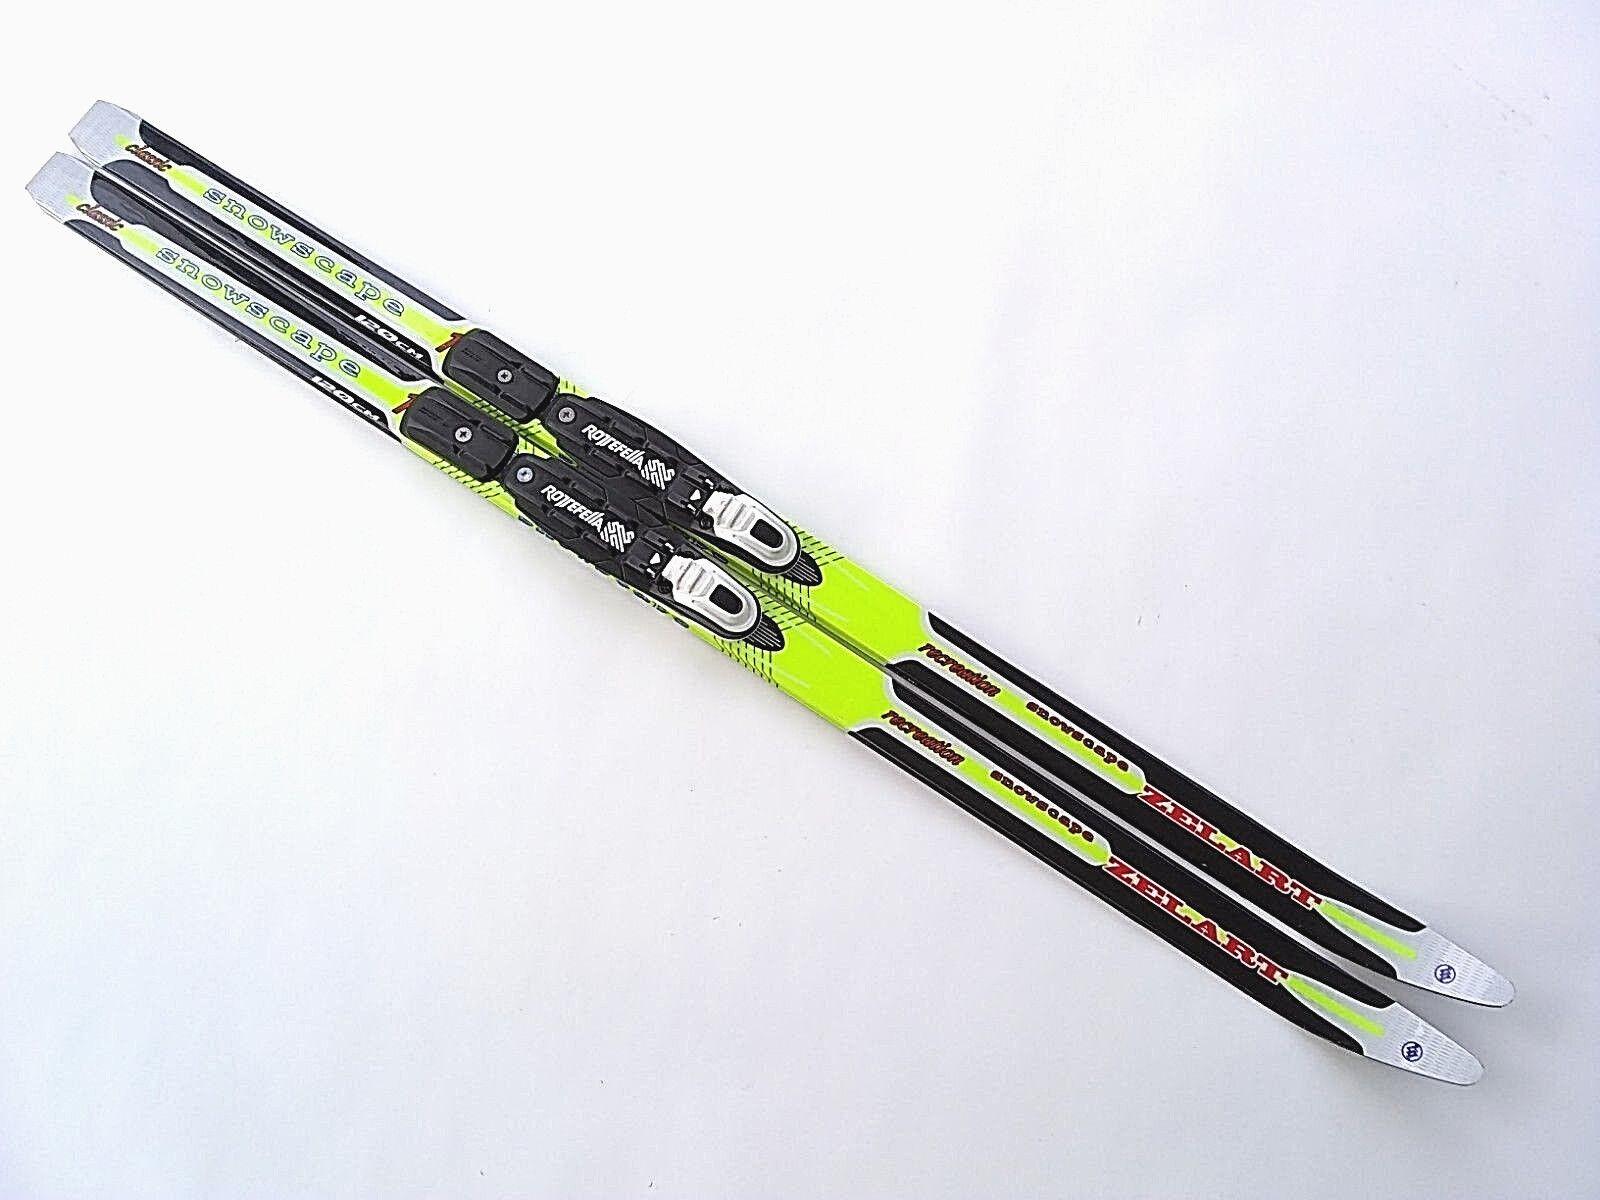 Kid's Waxless Skis NNN Bindings by redtefella Cross Country XC Youth Nordic